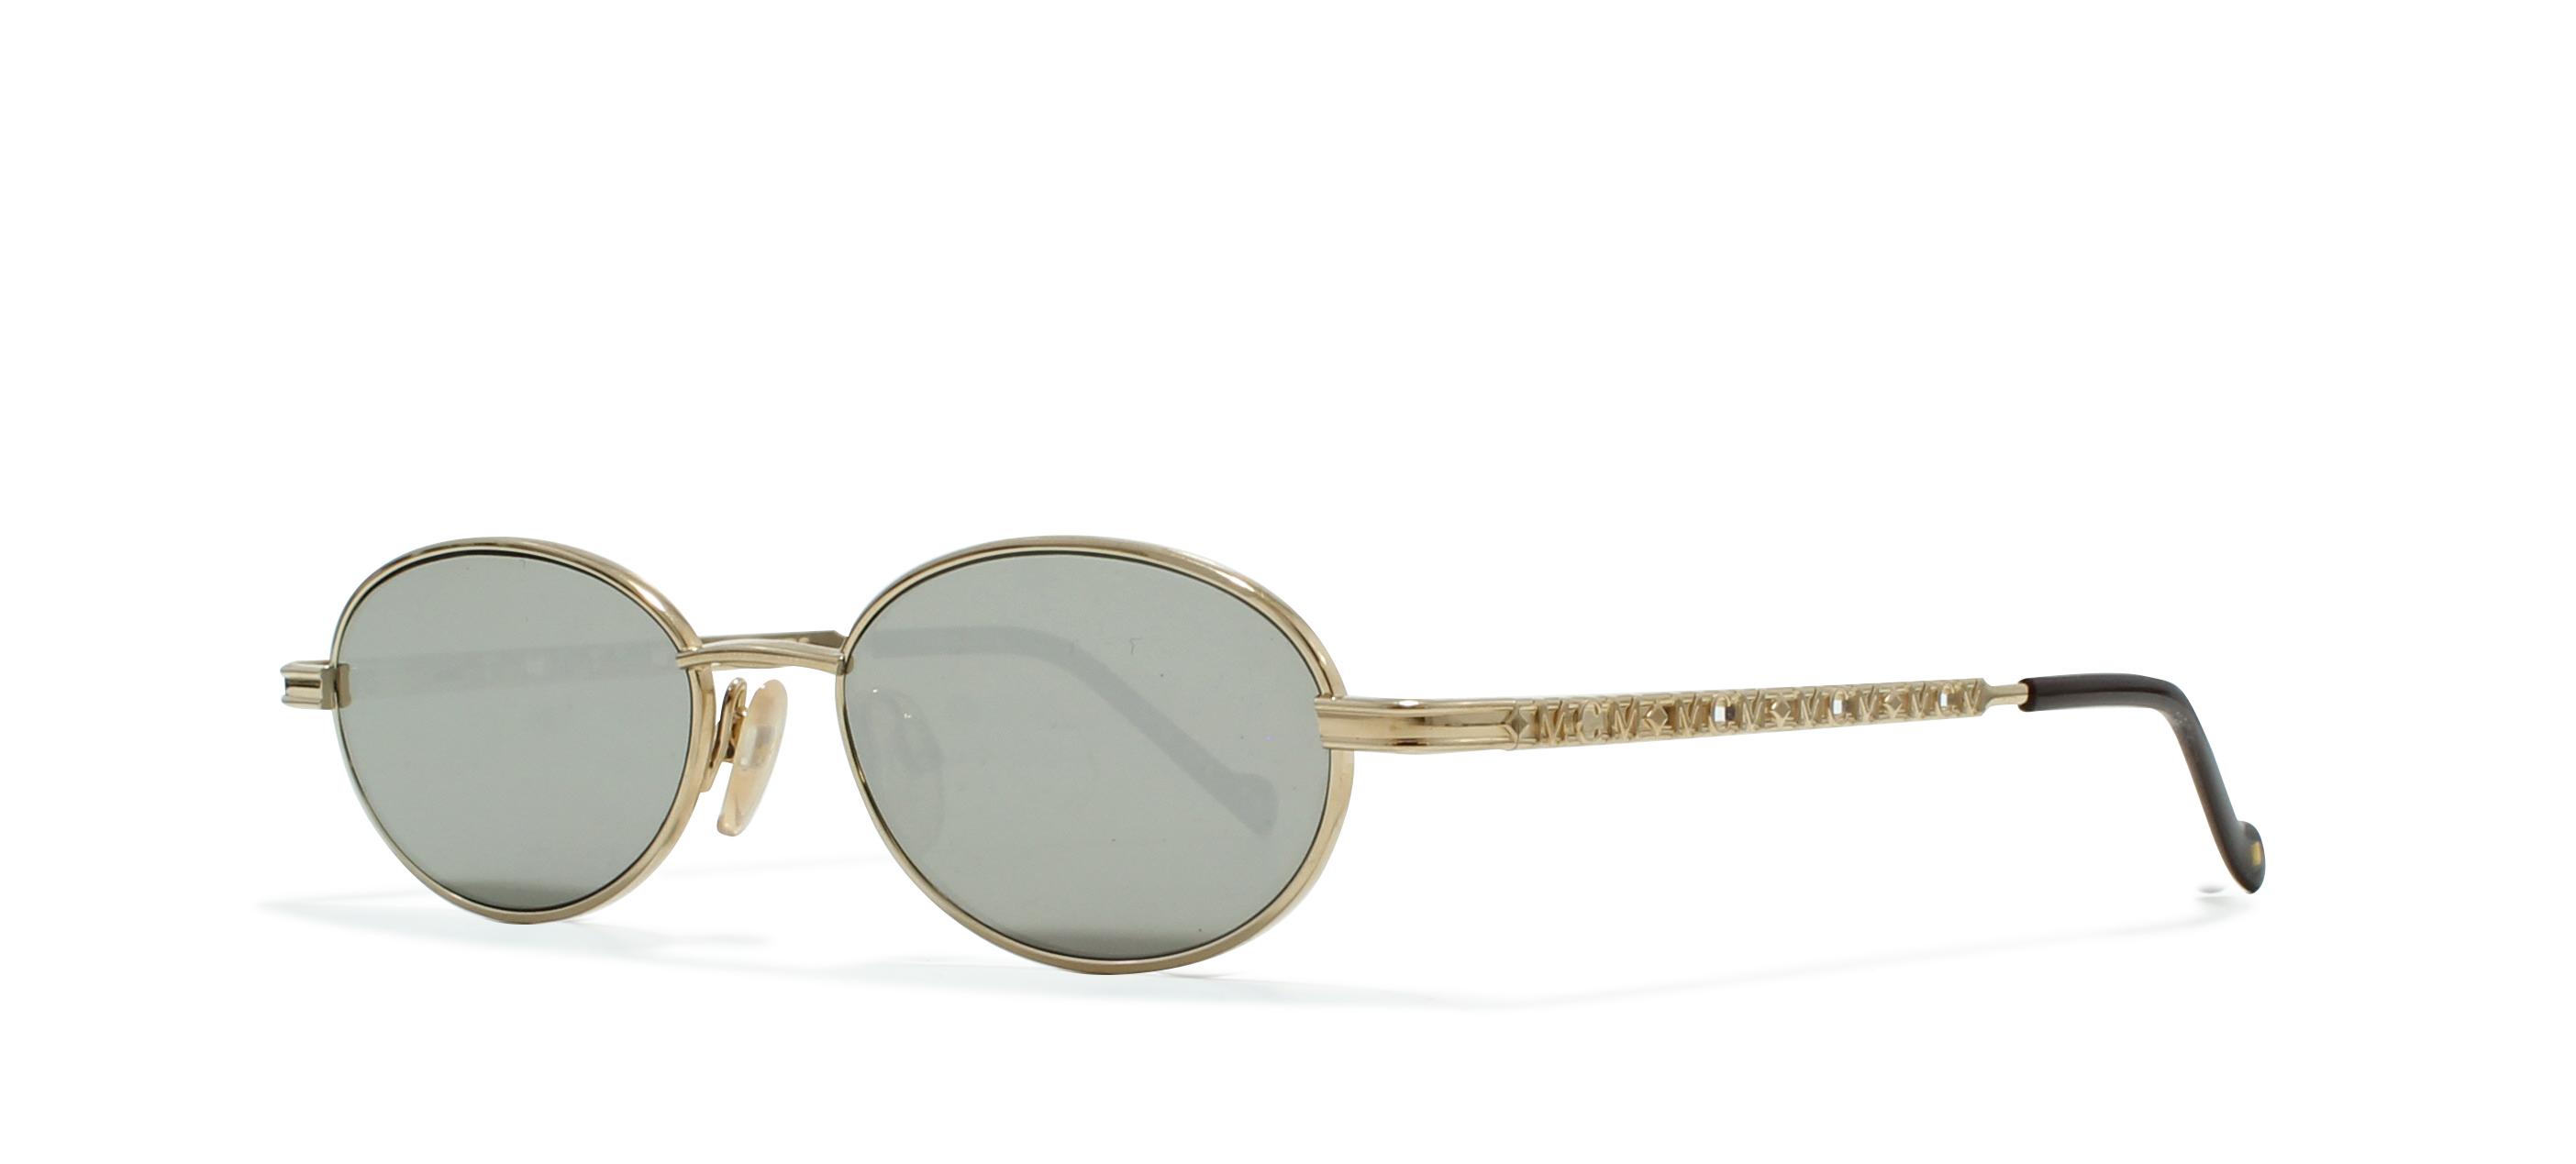 bc87dae28719 Cartier Sorbonne T8200.260 GLD Gold Certified Vintage Oval ...